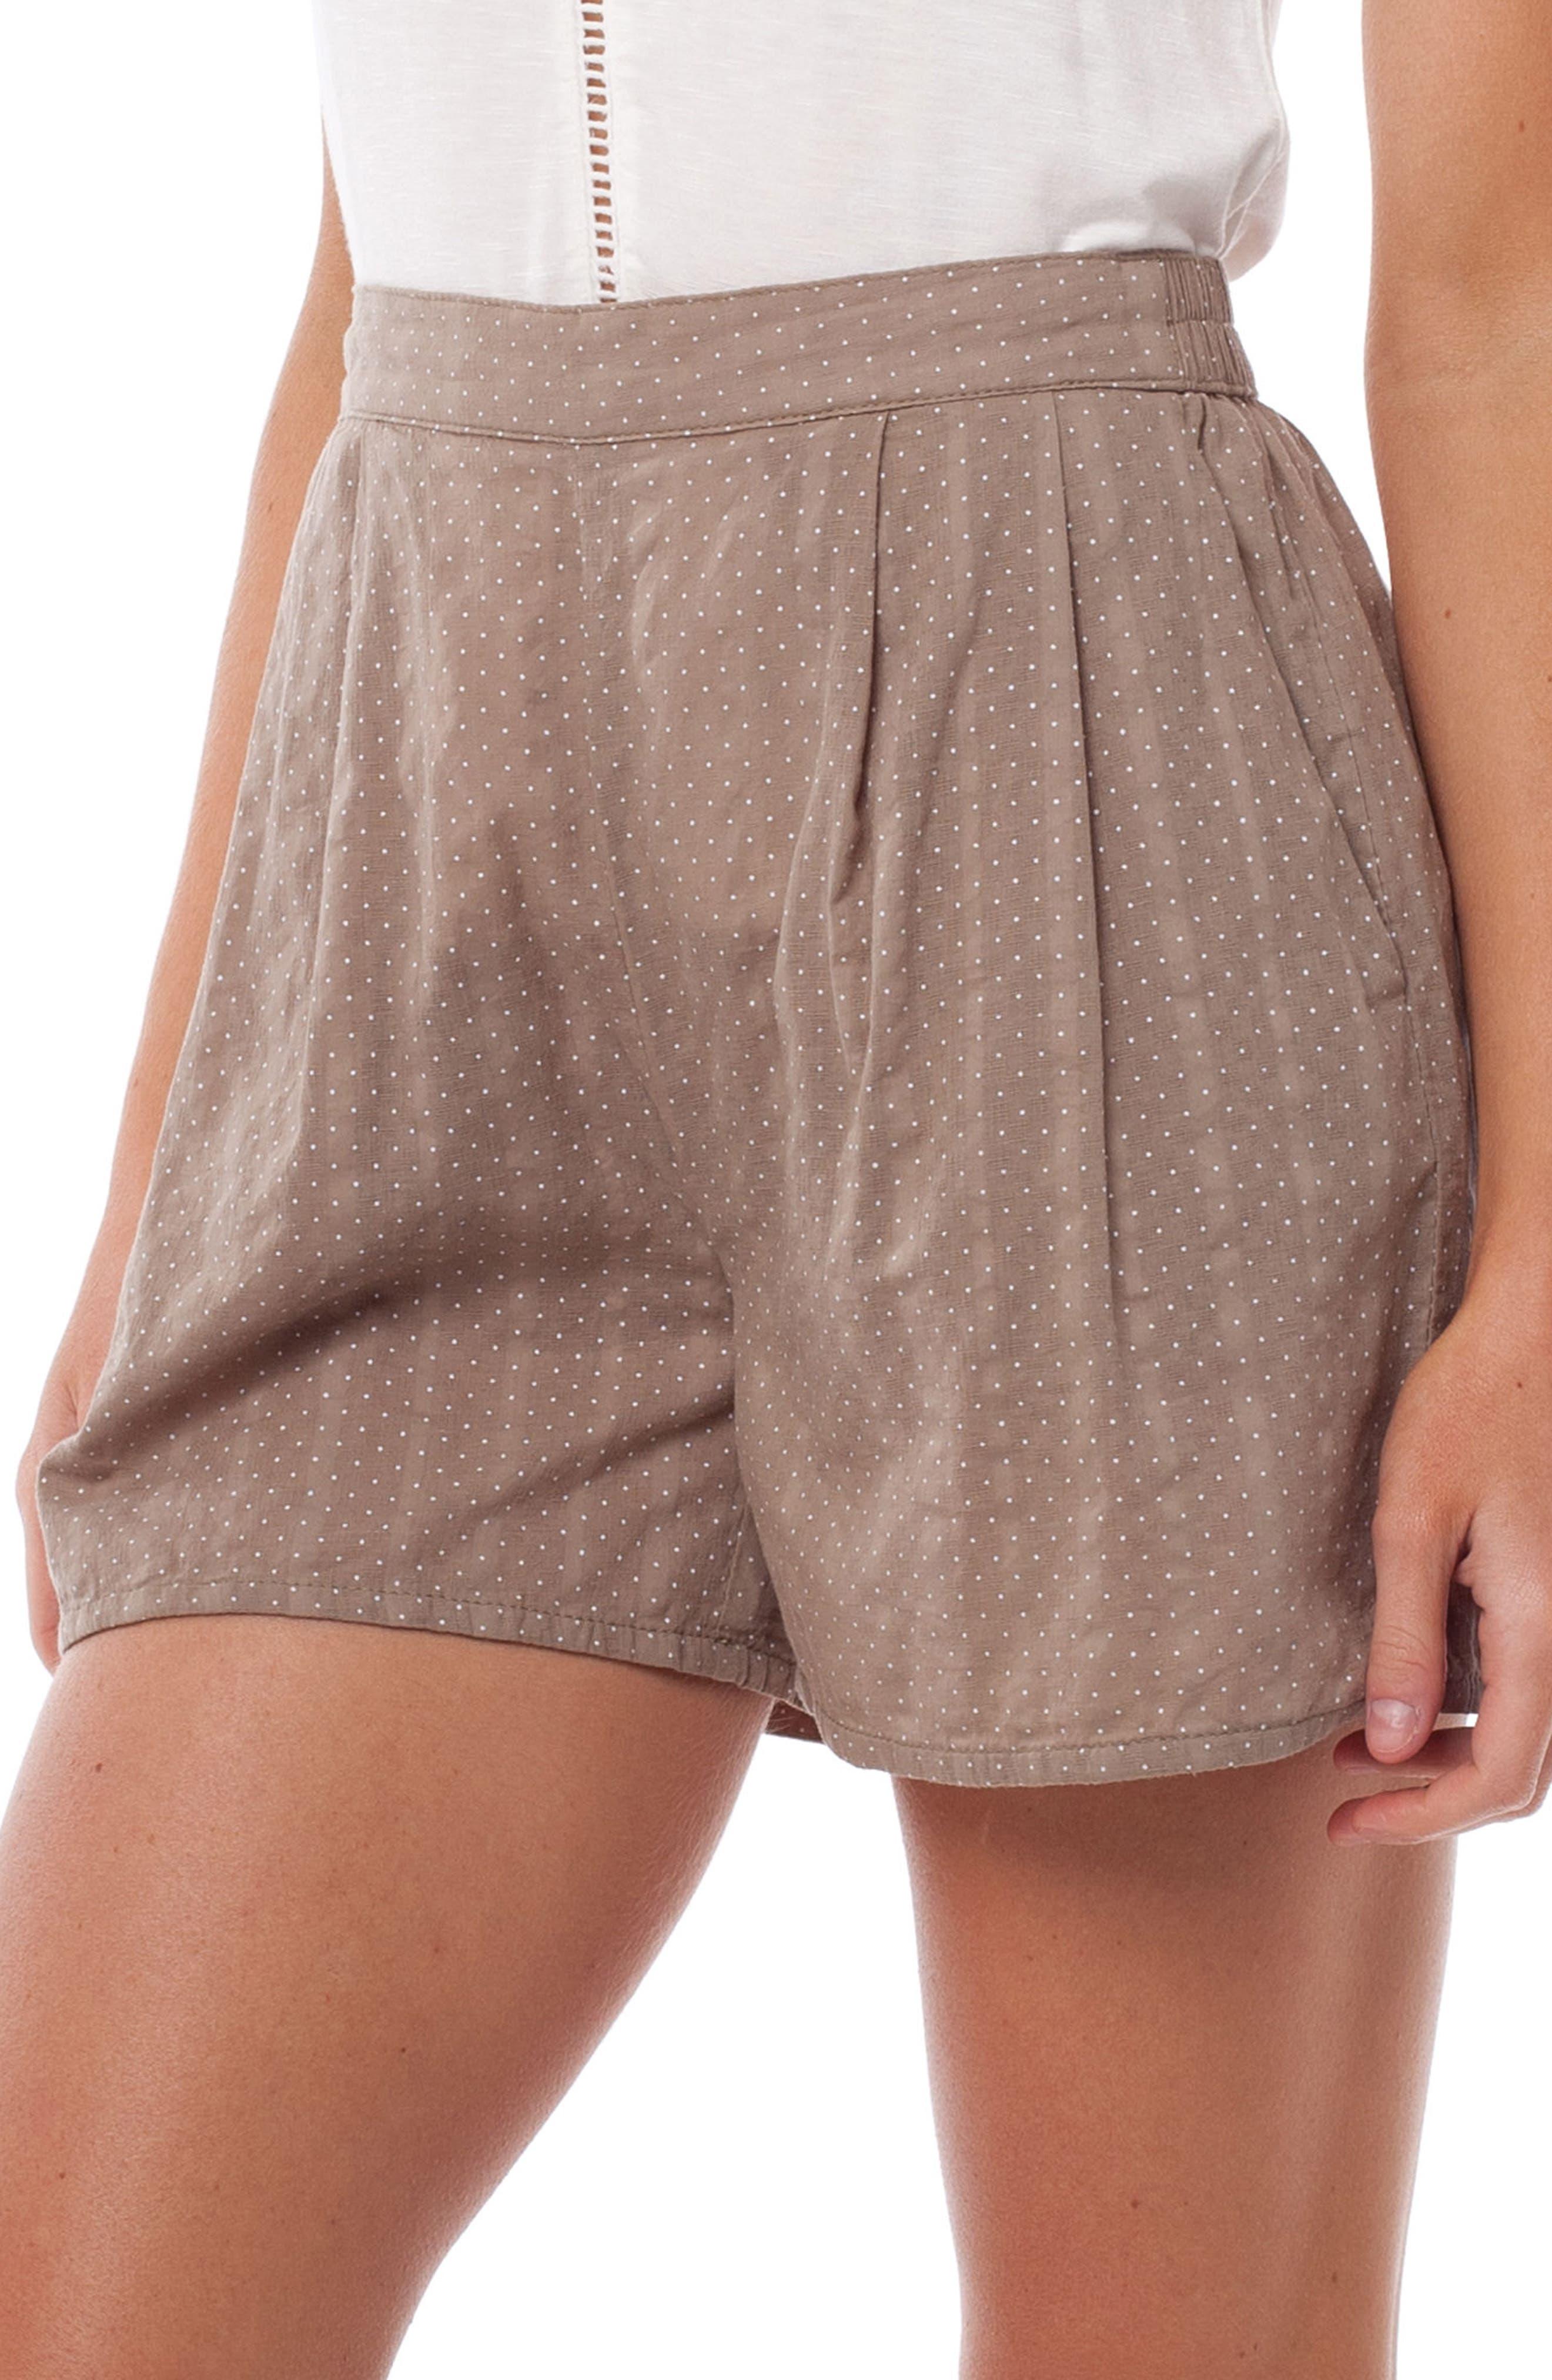 Messina Cover-Up Shorts,                             Alternate thumbnail 3, color,                             Chai